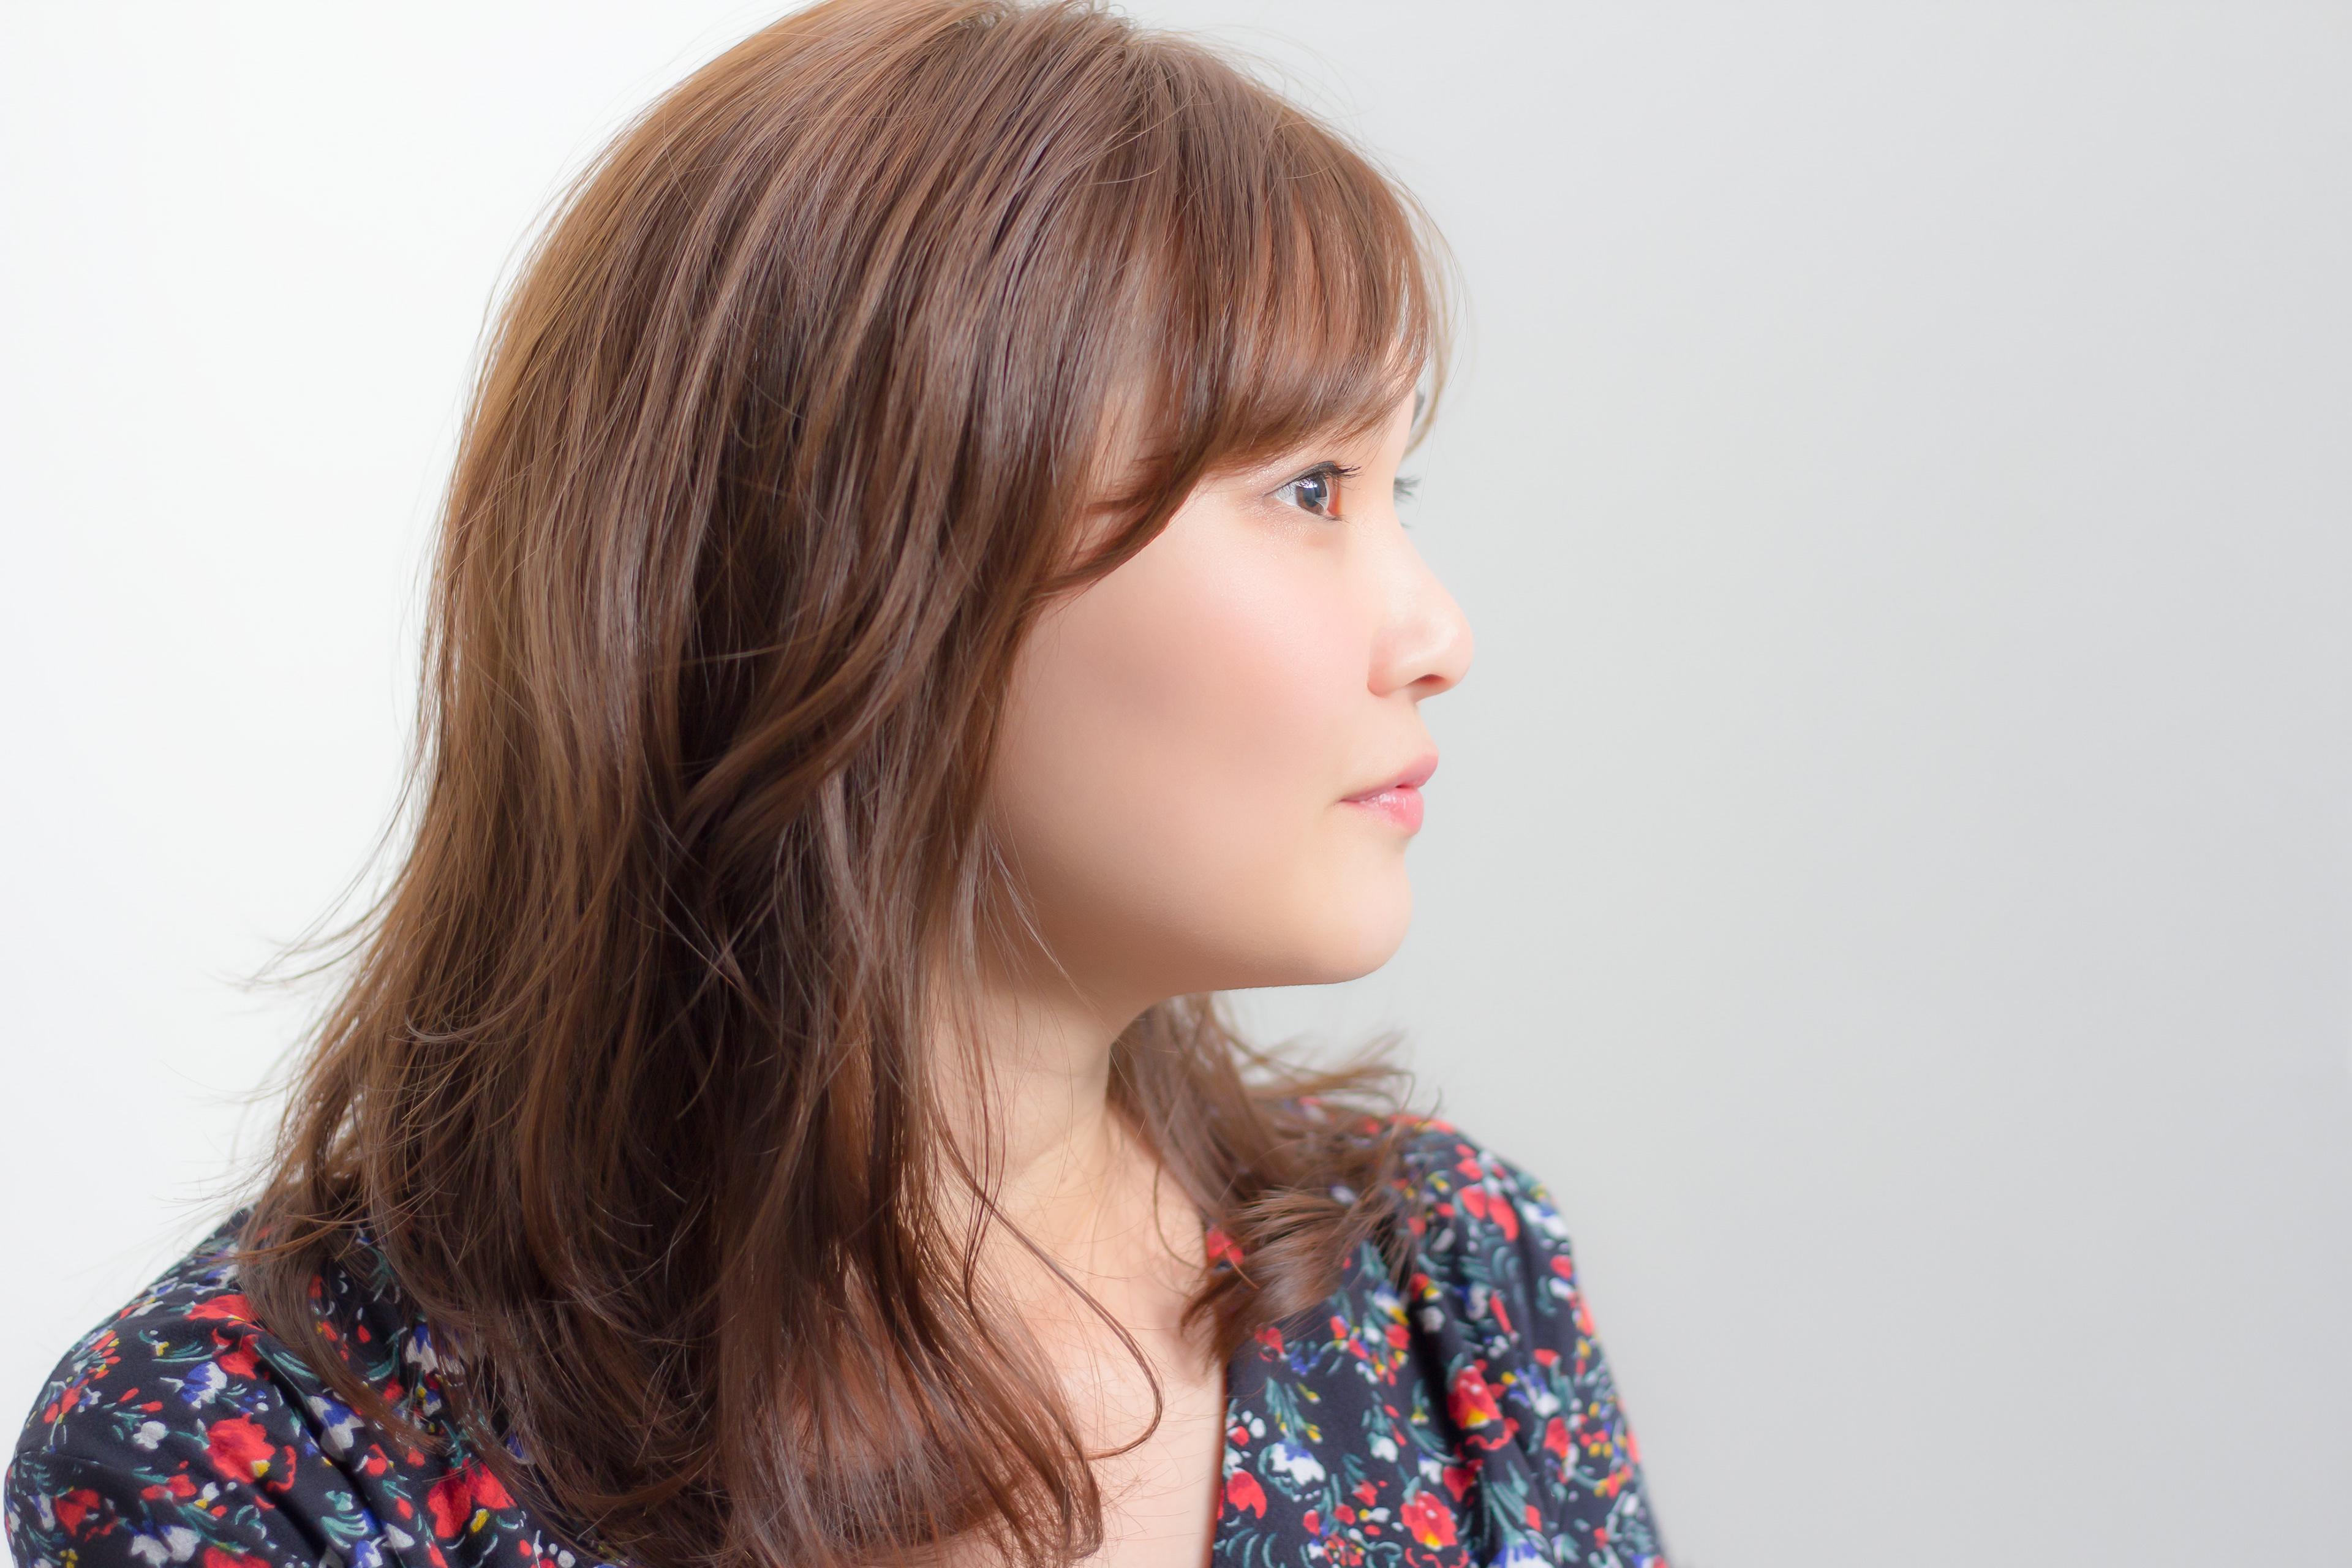 Toshinori Miyagawa Seasoned Graphic Designer With Tremendous Success Creating Compelling Visual Stories And Artwork Lamp Hair Hairstyle Gallery Photography